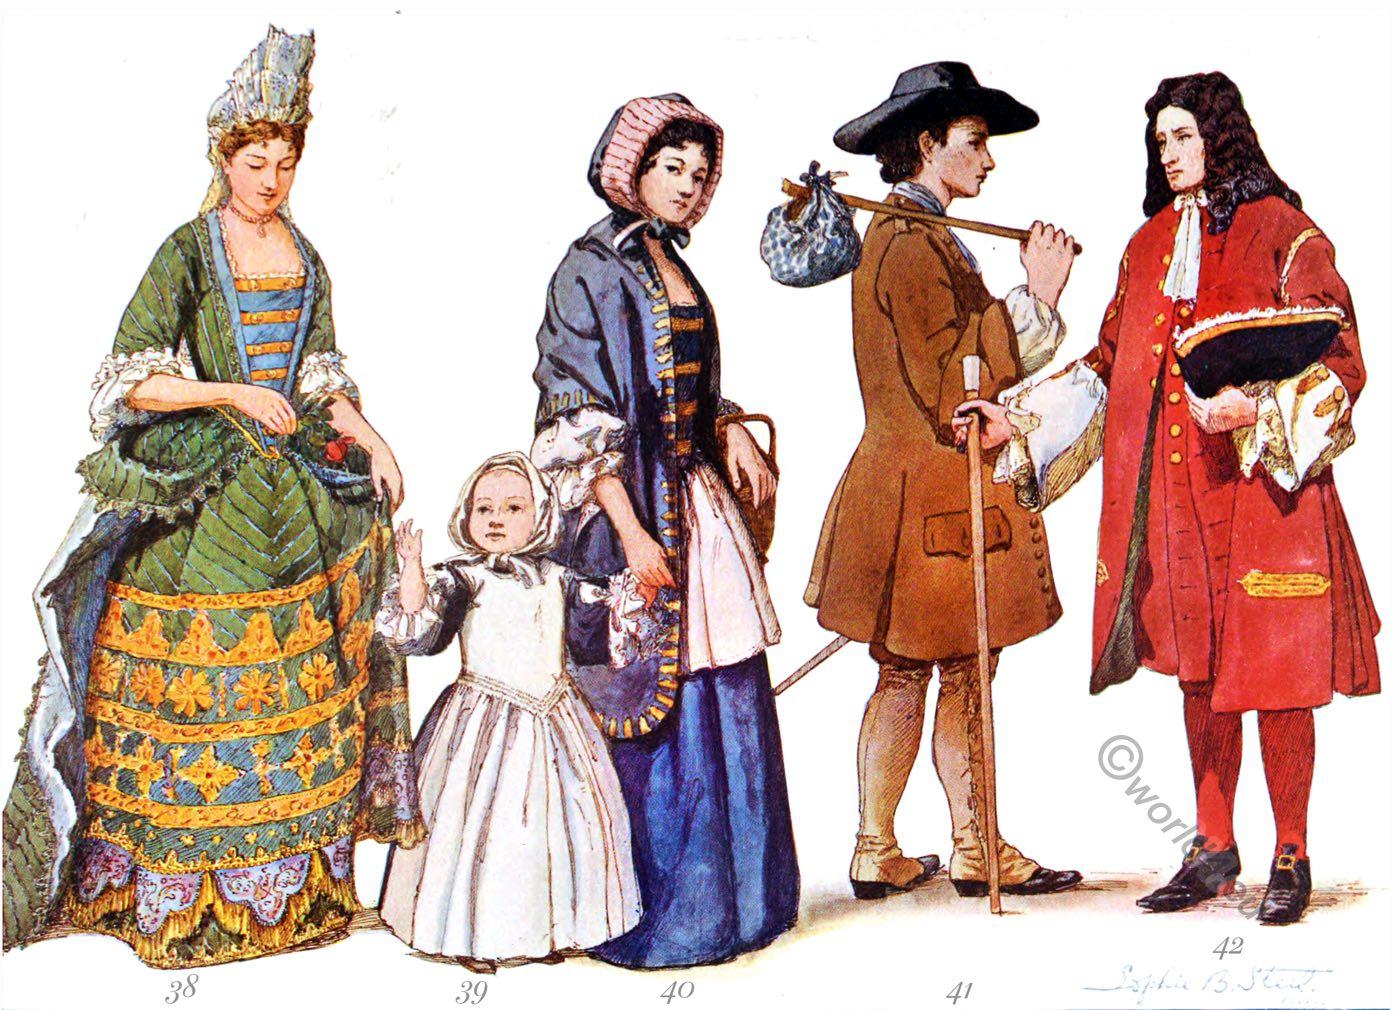 Historic, dress, baroque, england, fashion history, james, william, mary, Elisabeth McClellan